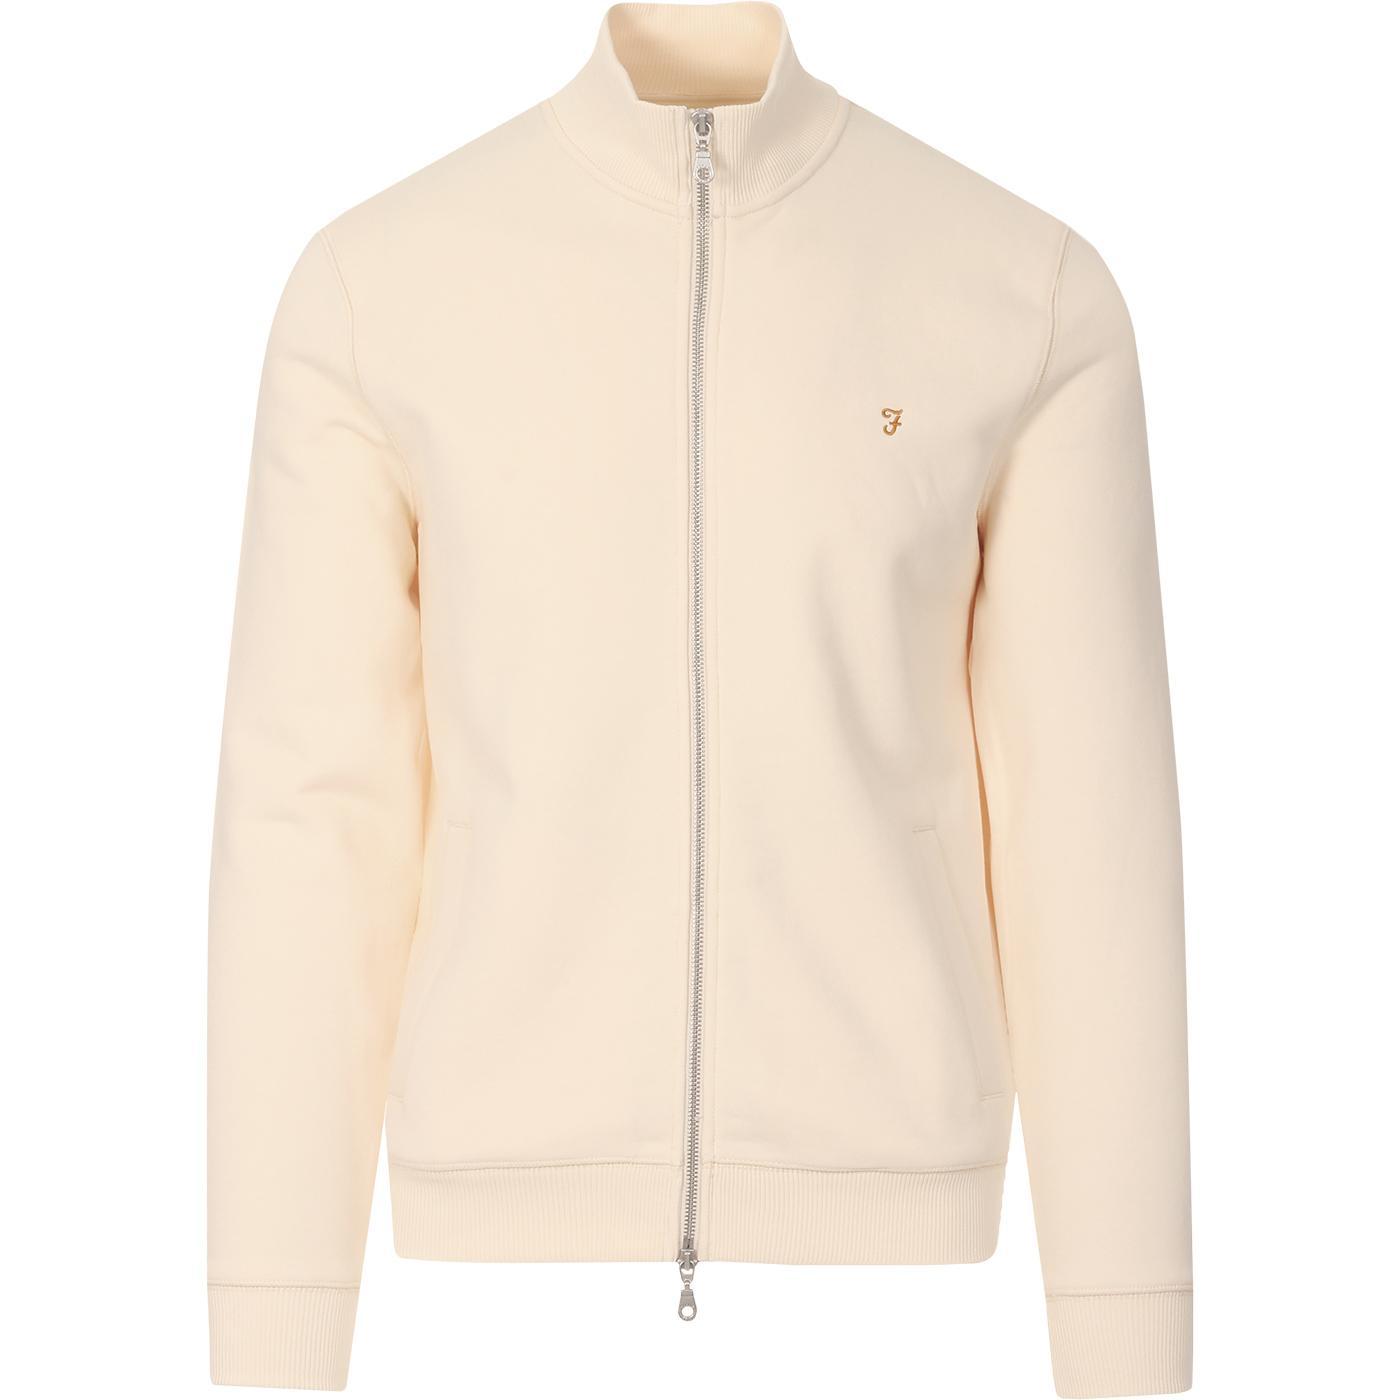 Bowmont FARAH Retro Plain Zip Track Jacket (Cream)